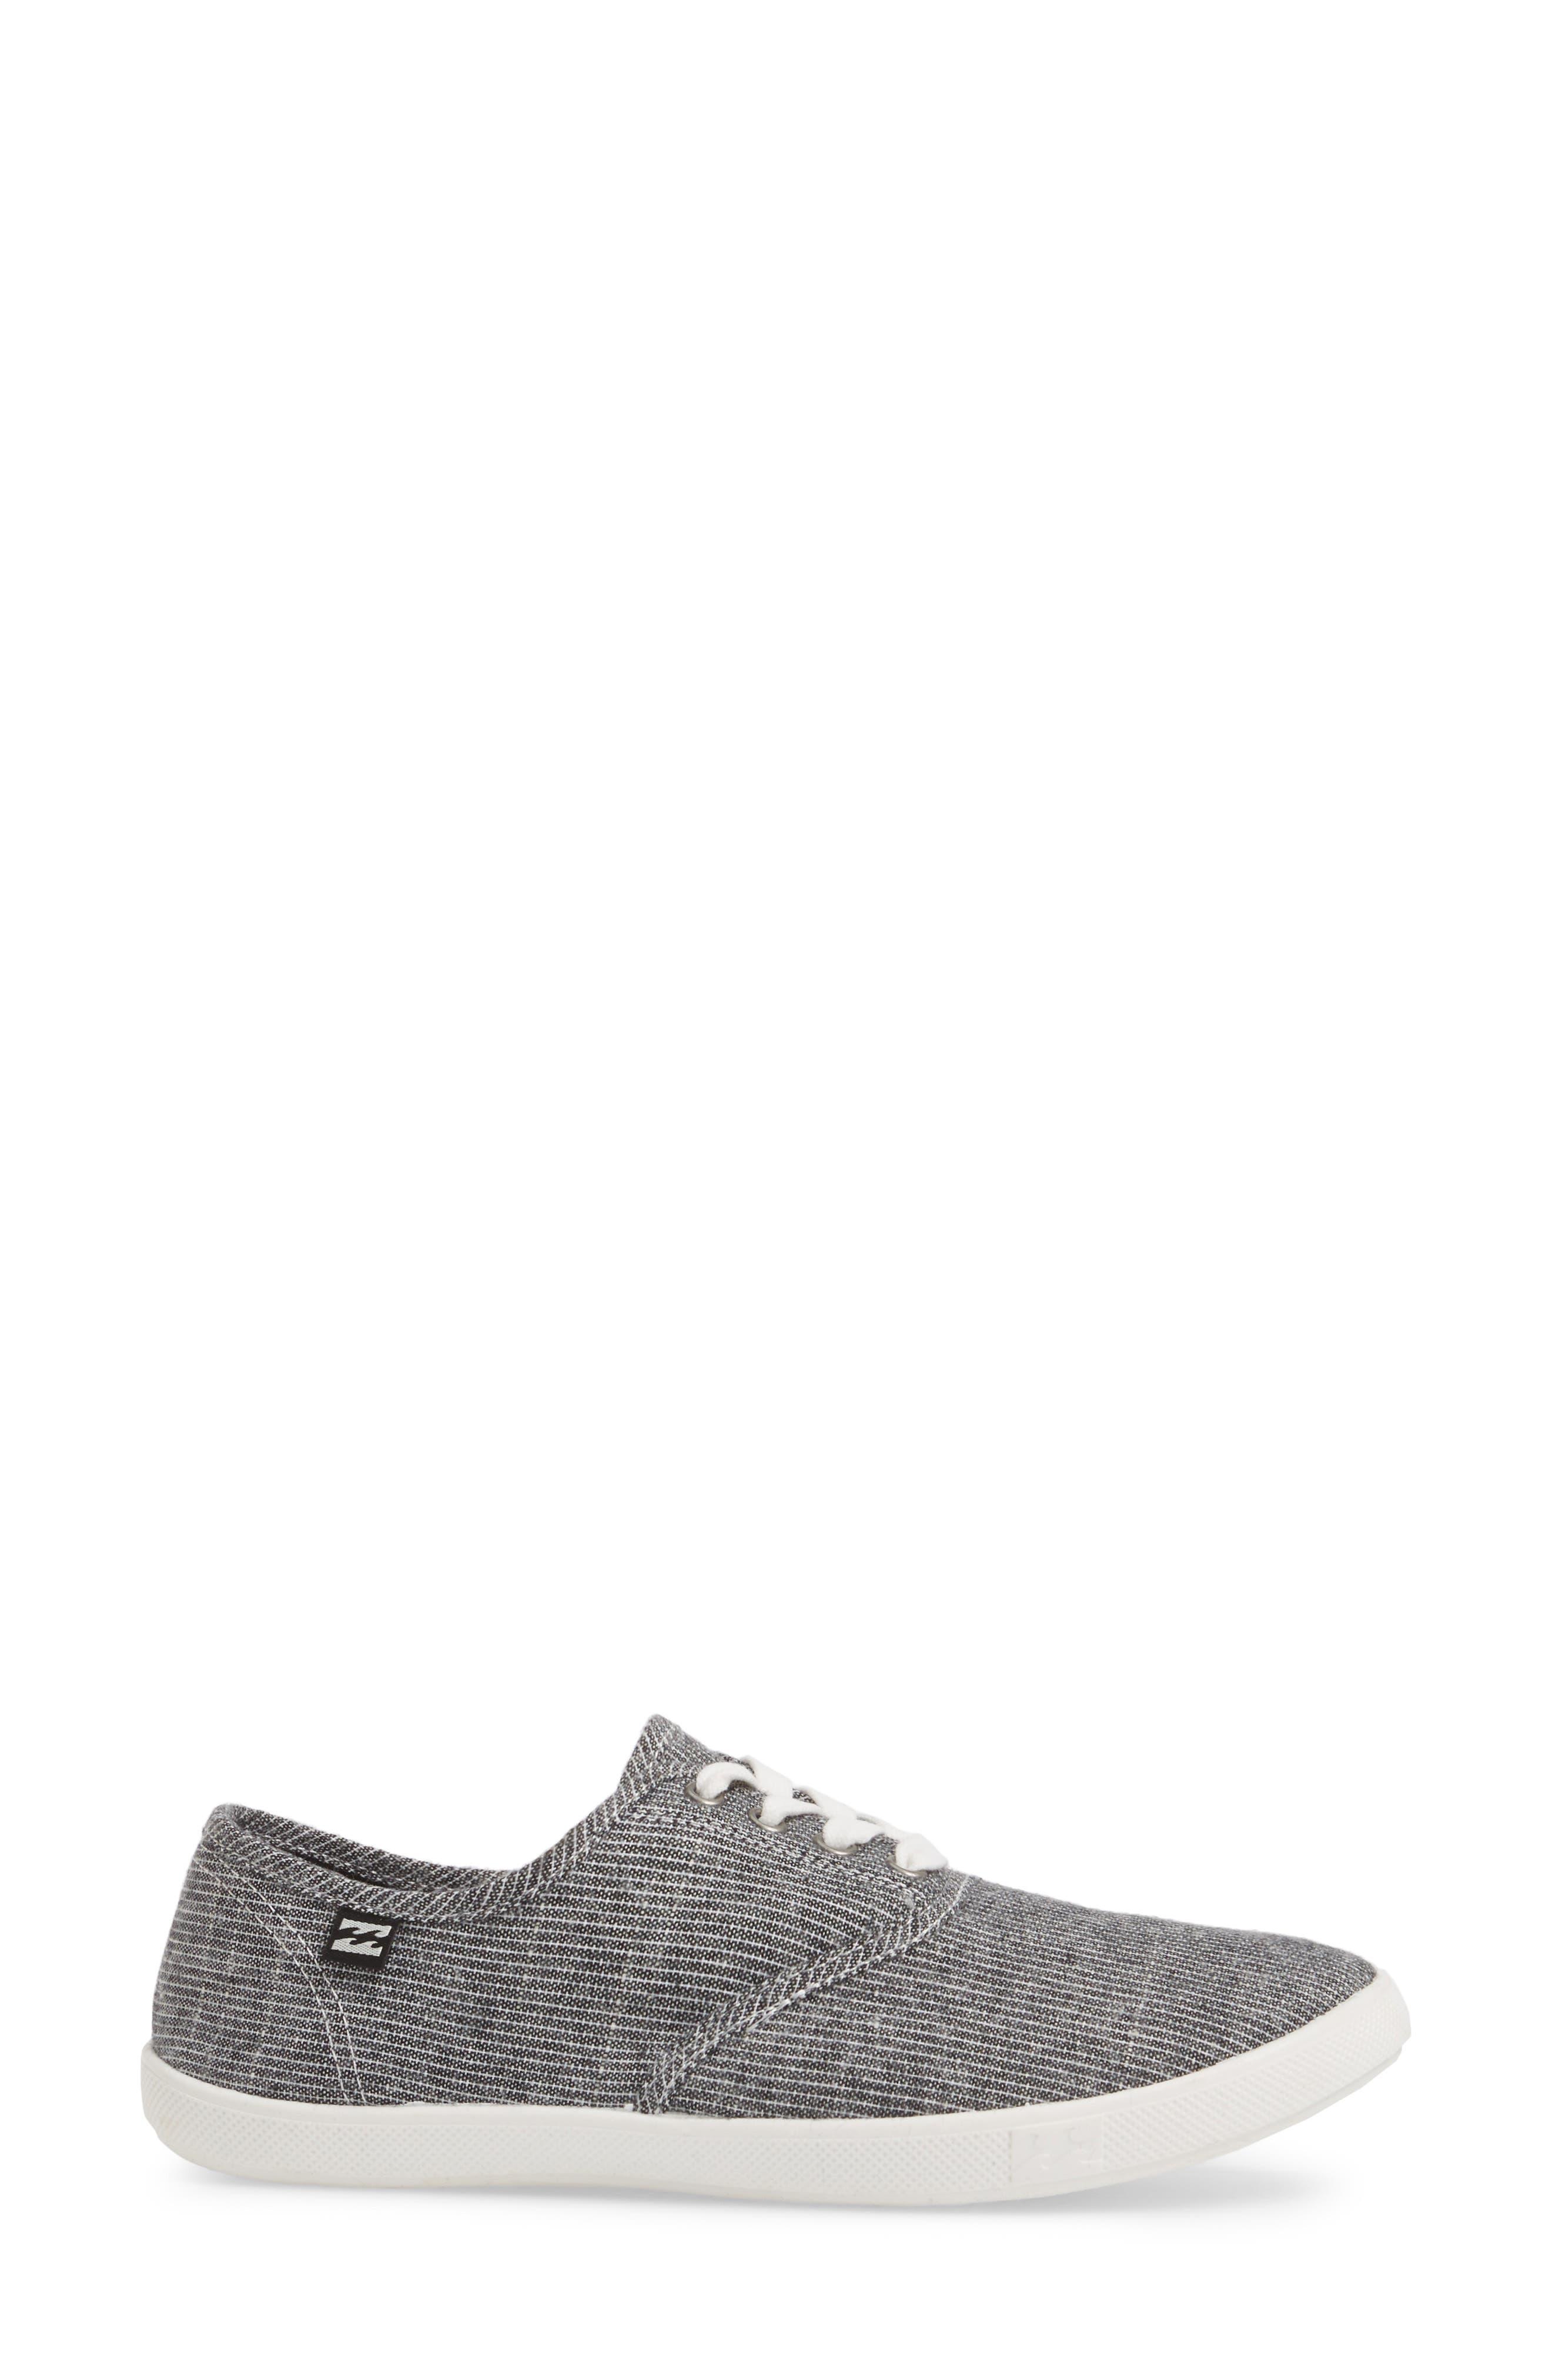 Addy Sneaker,                             Alternate thumbnail 3, color,                             Black/ White